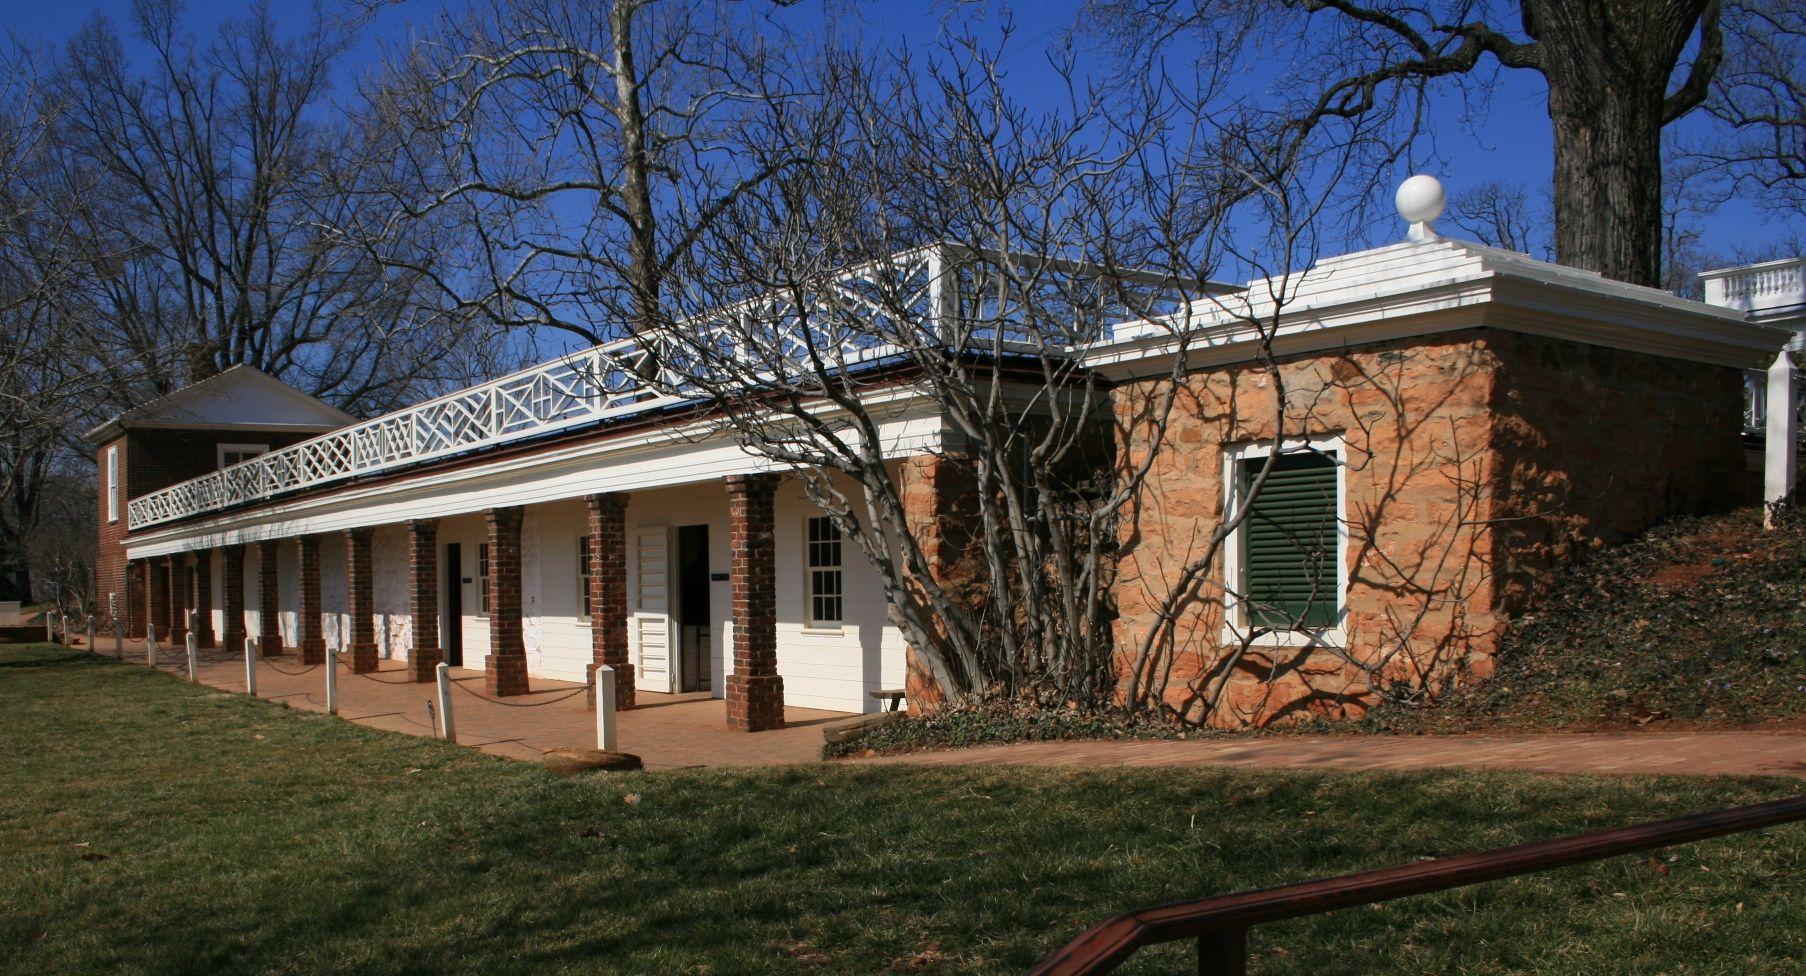 Kitchens and slave quarters | Thomas Jefferson | Pinterest | Thomas ...